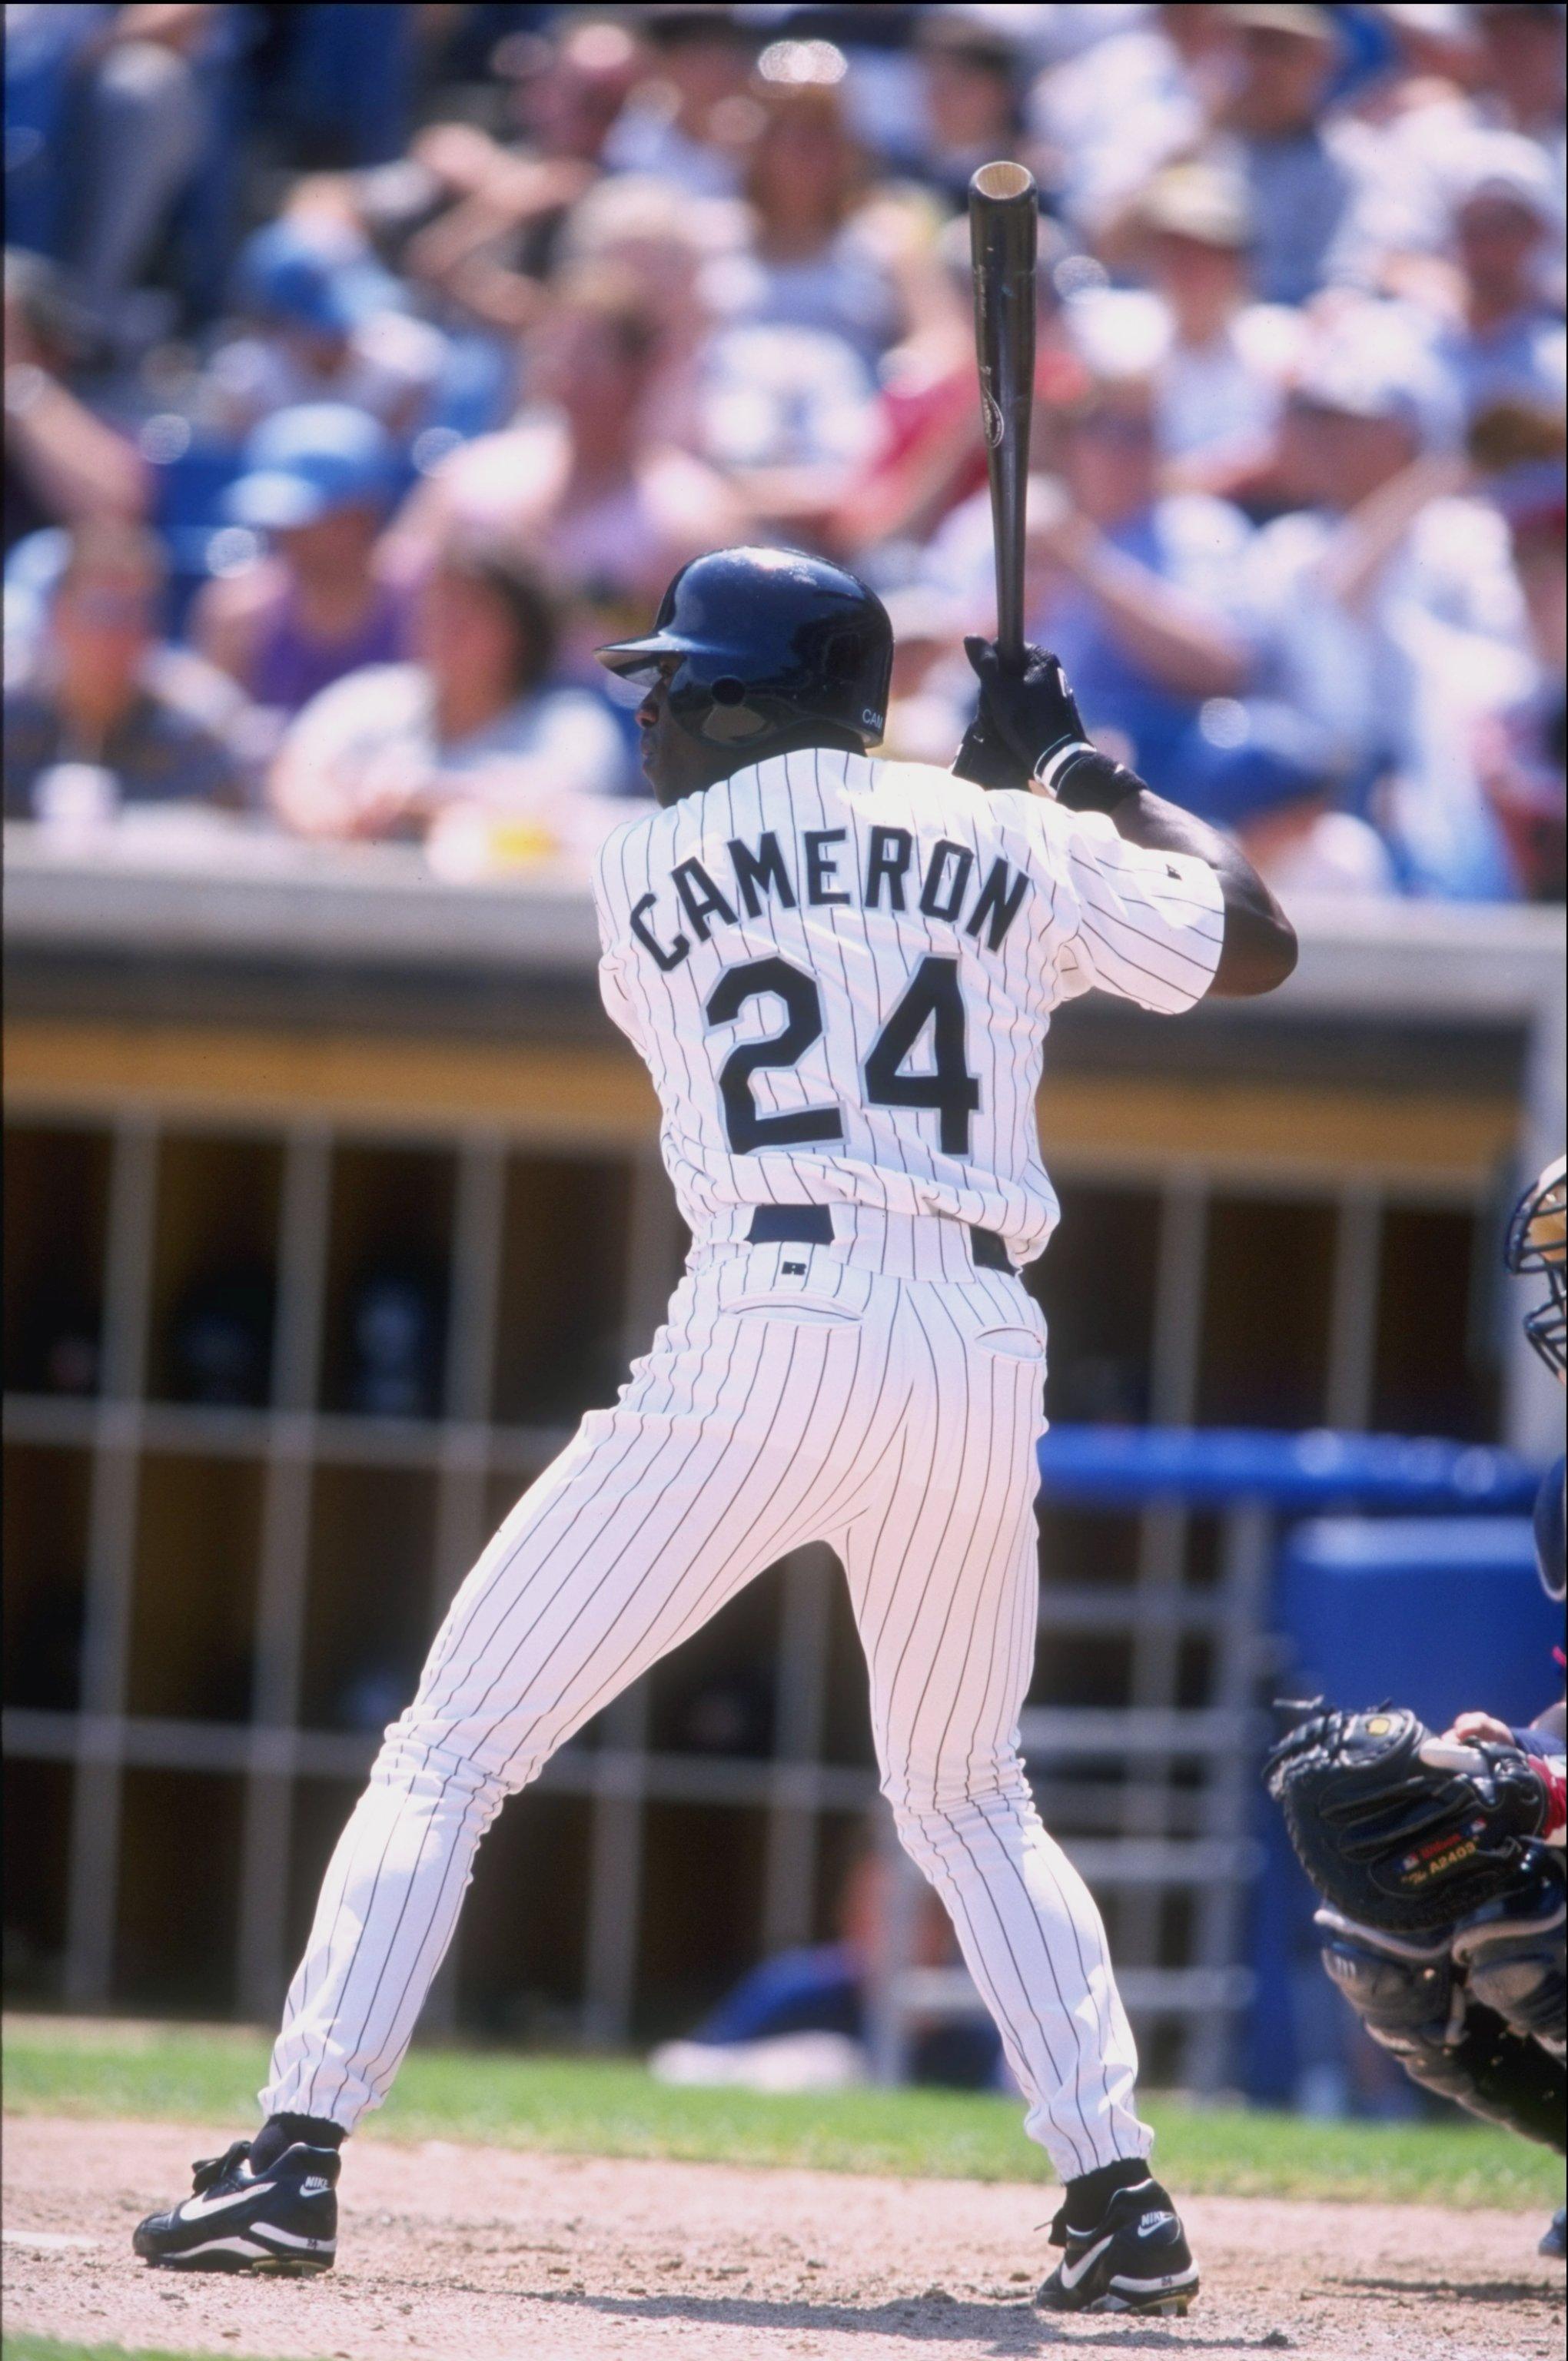 Mike Cameron #24